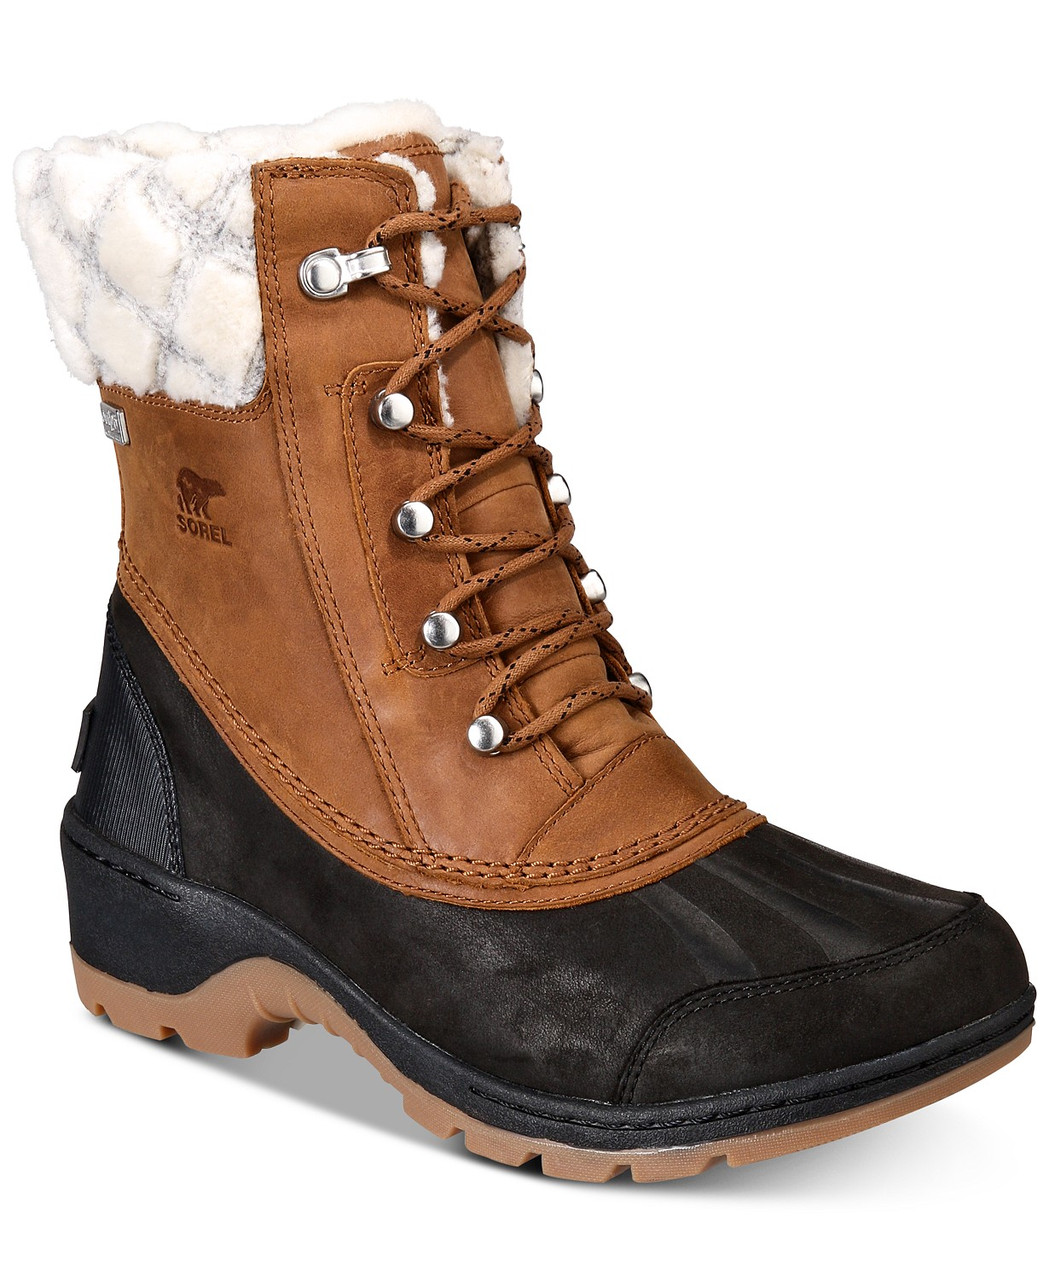 Sorel Женские ботинки - Е2